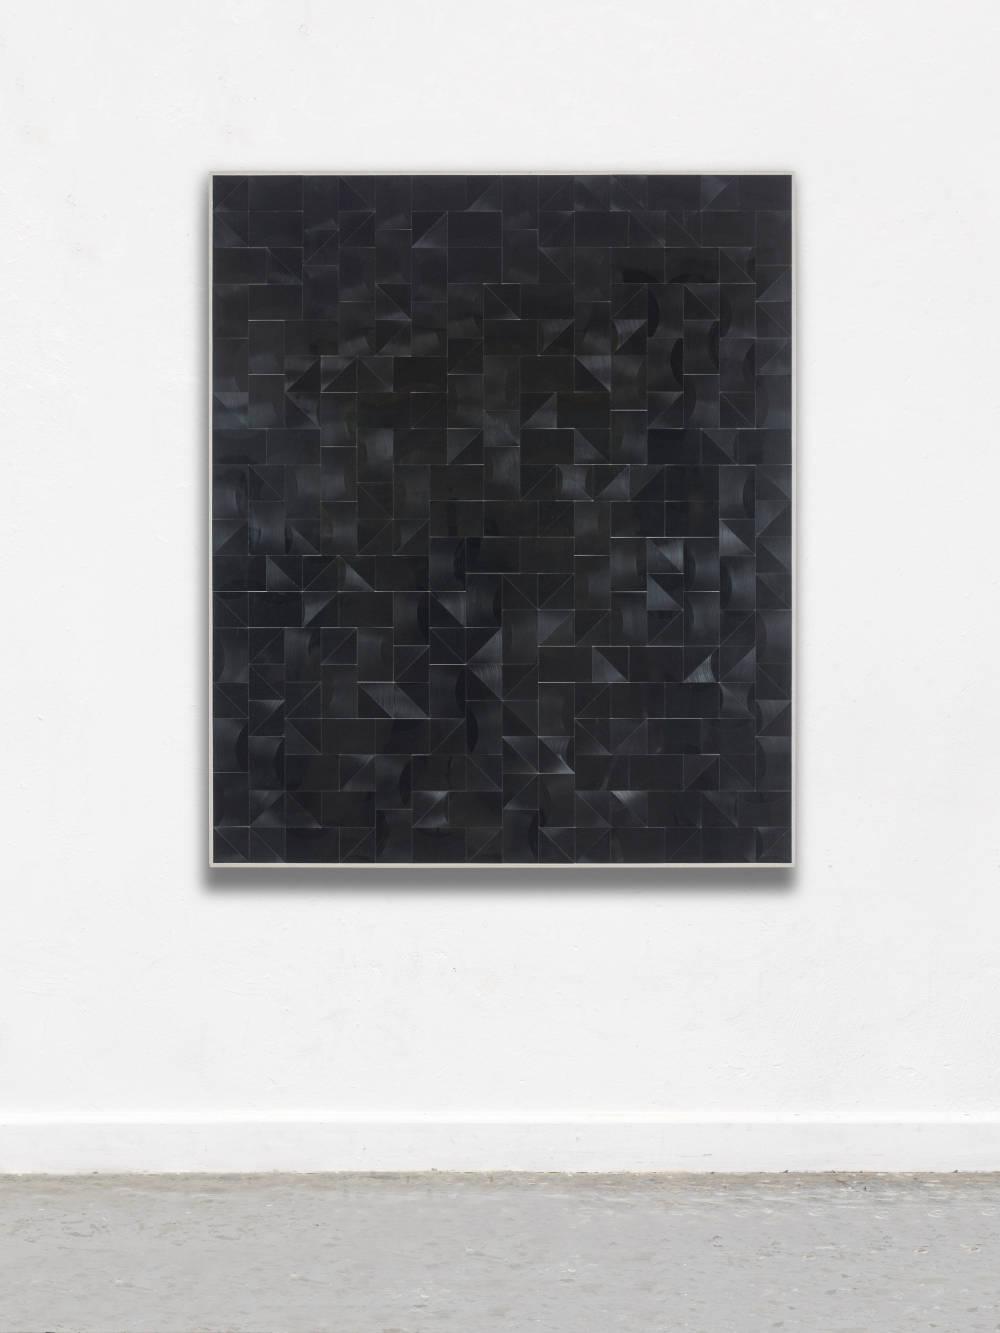 Gregor Hildebrandt, Kleines Feld, 2018. Cut vinyl records, canvas, wood 154 x 130 cm, 60.6 x 11.8 in. Courtesy of the artist and Perrotin.